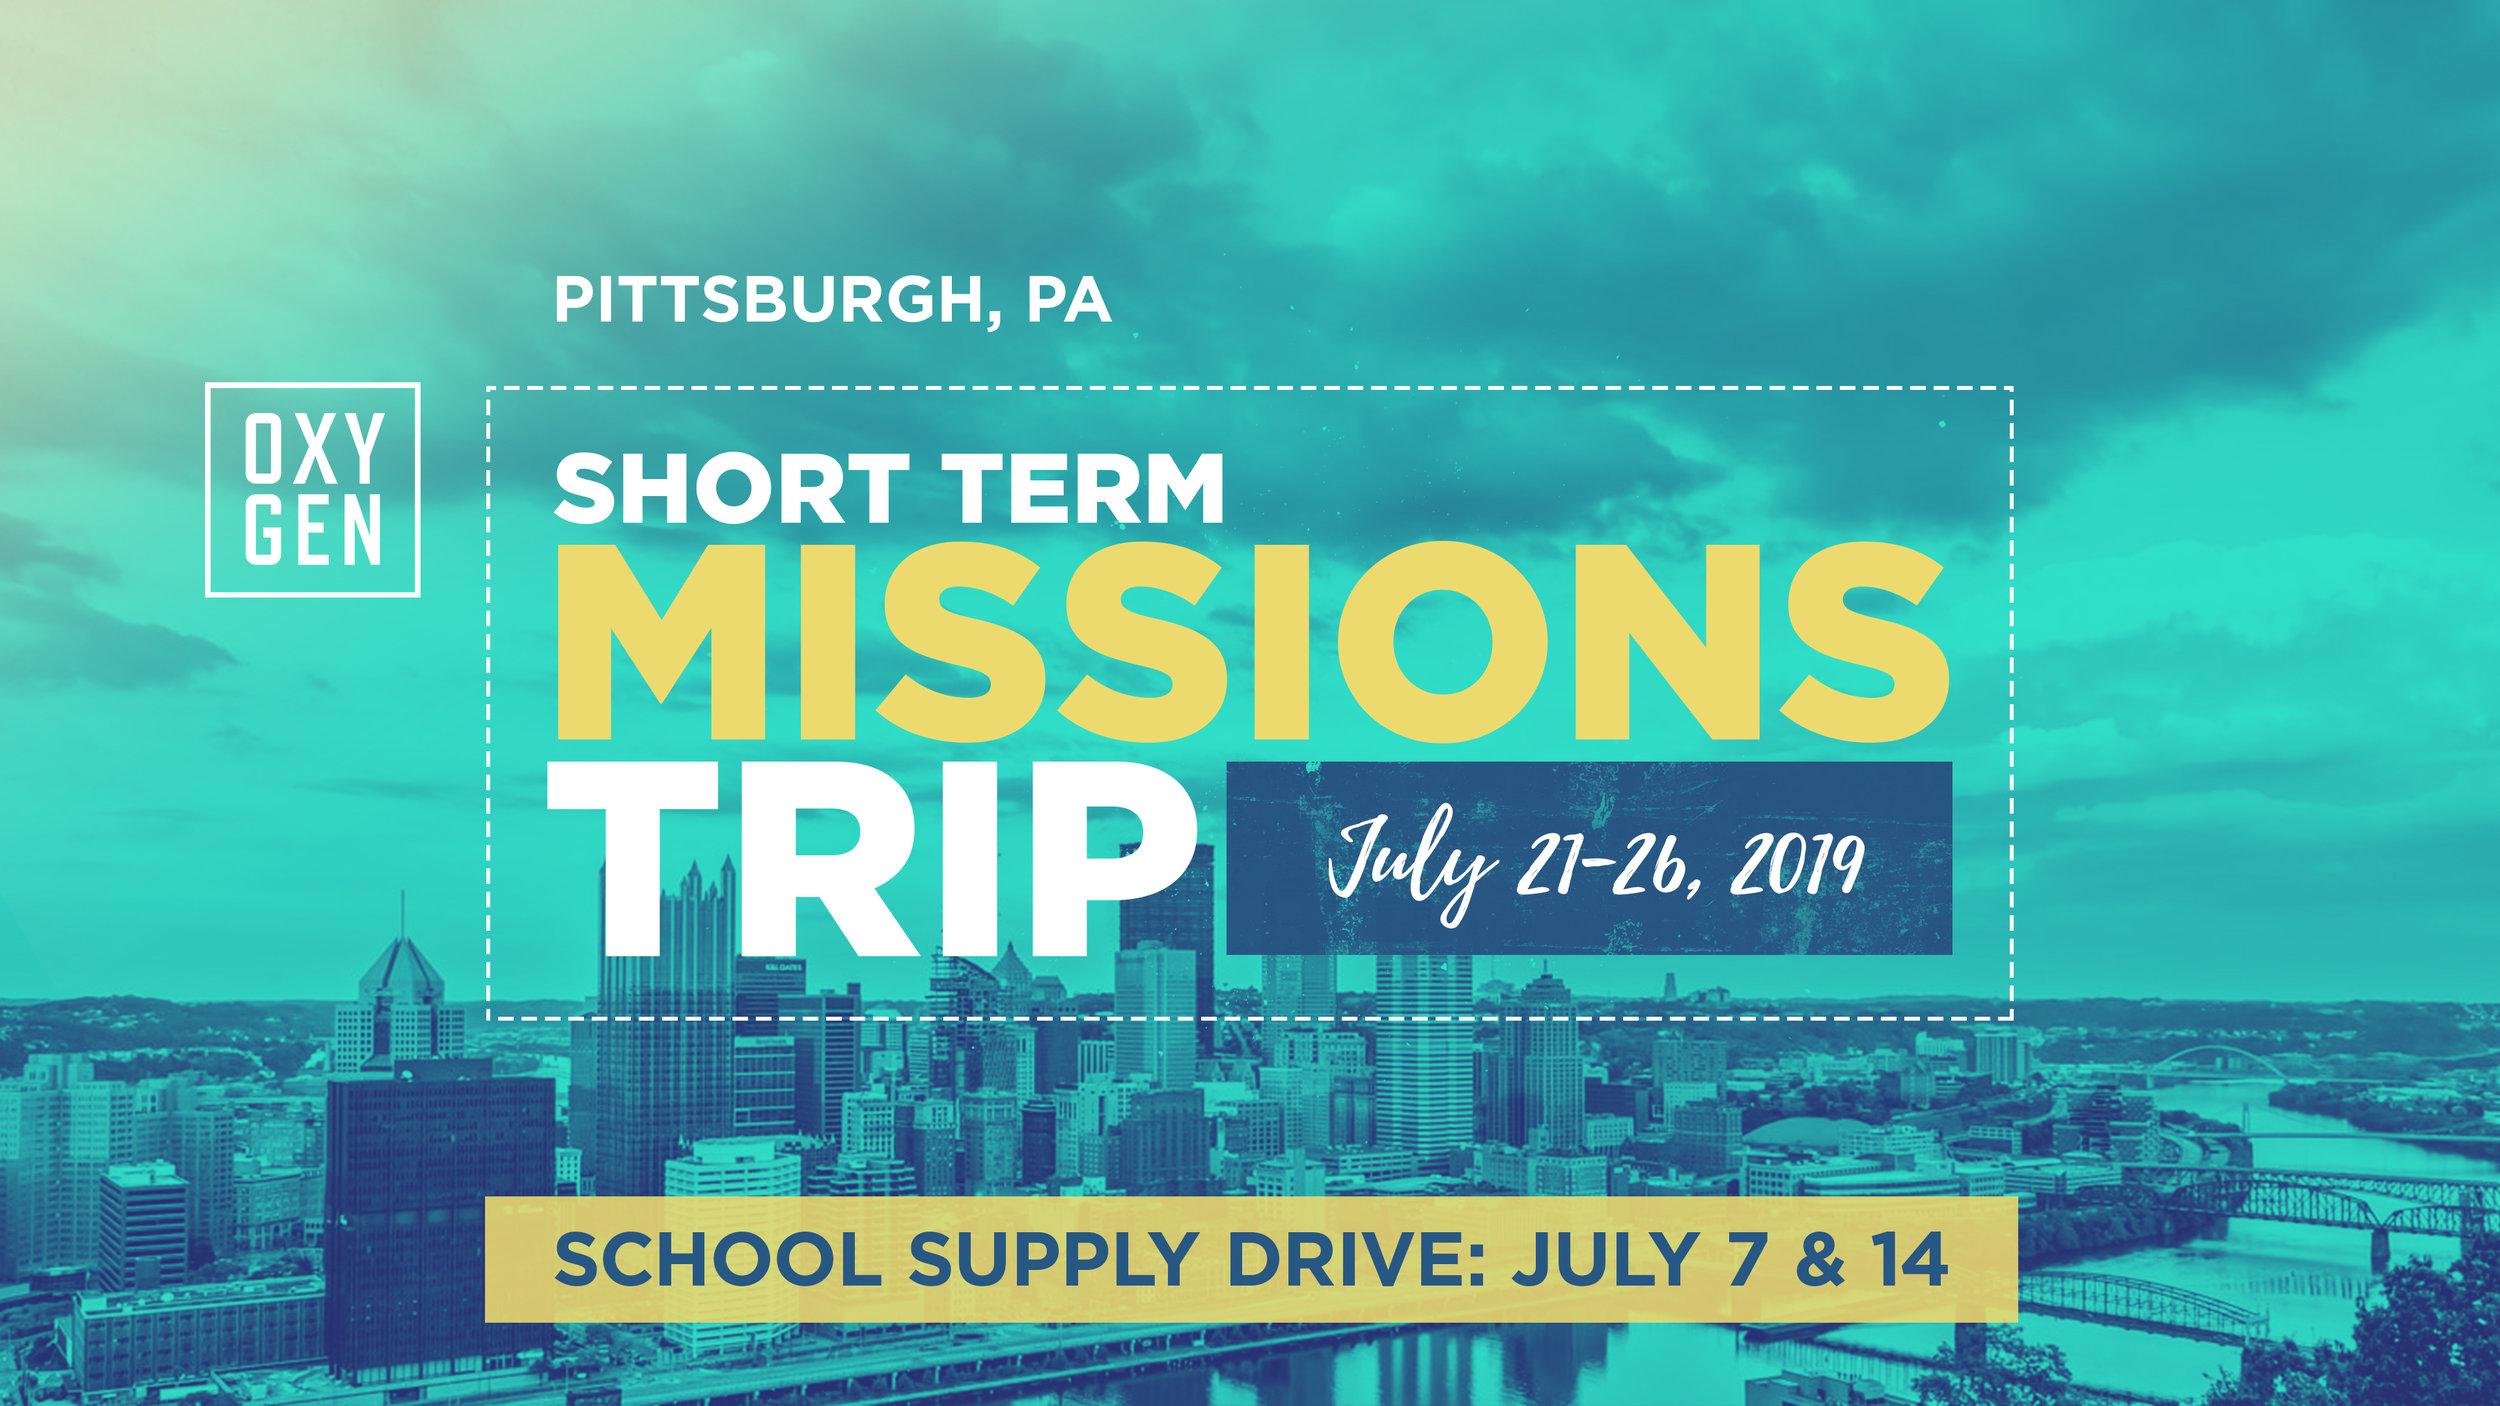 Missions_Pittsburgh2019_schoolsupplies.jpg